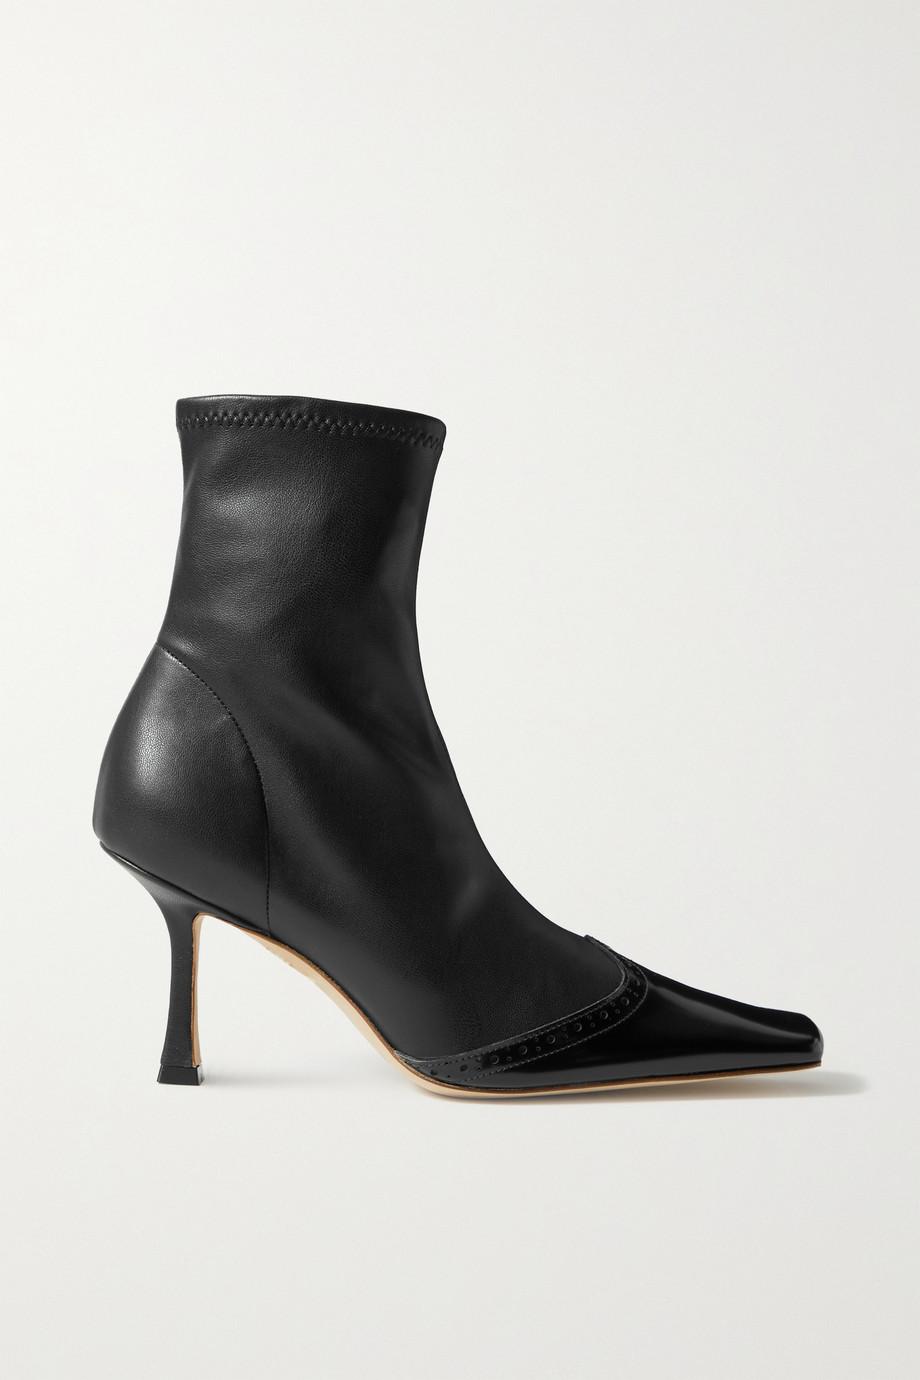 A.W.A.K.E. MODE Bernie paneled faux leather ankle boots